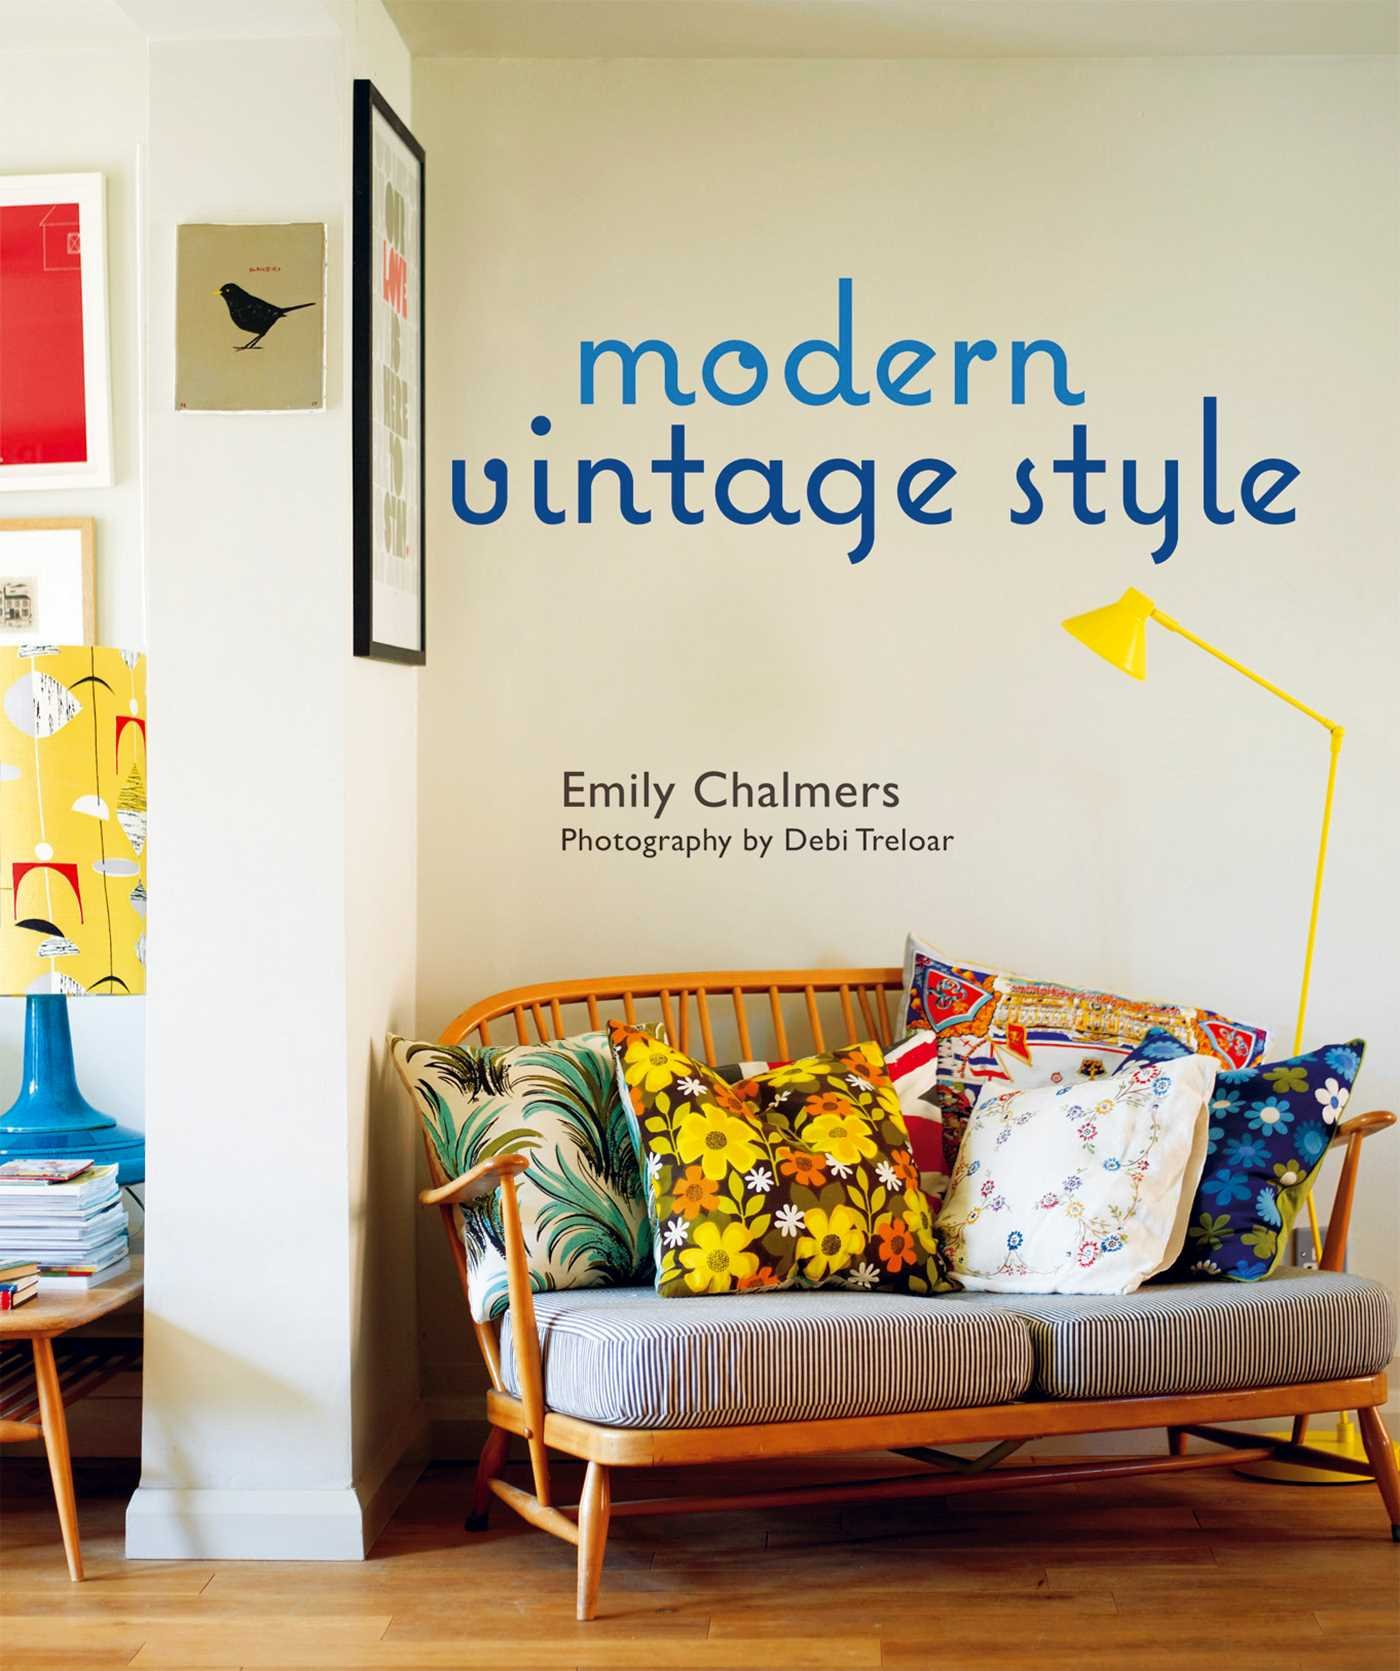 Modern Vintage Style Emily Chalmers Debi Treloar Ali Hanan 9781849750998 Amazon Books